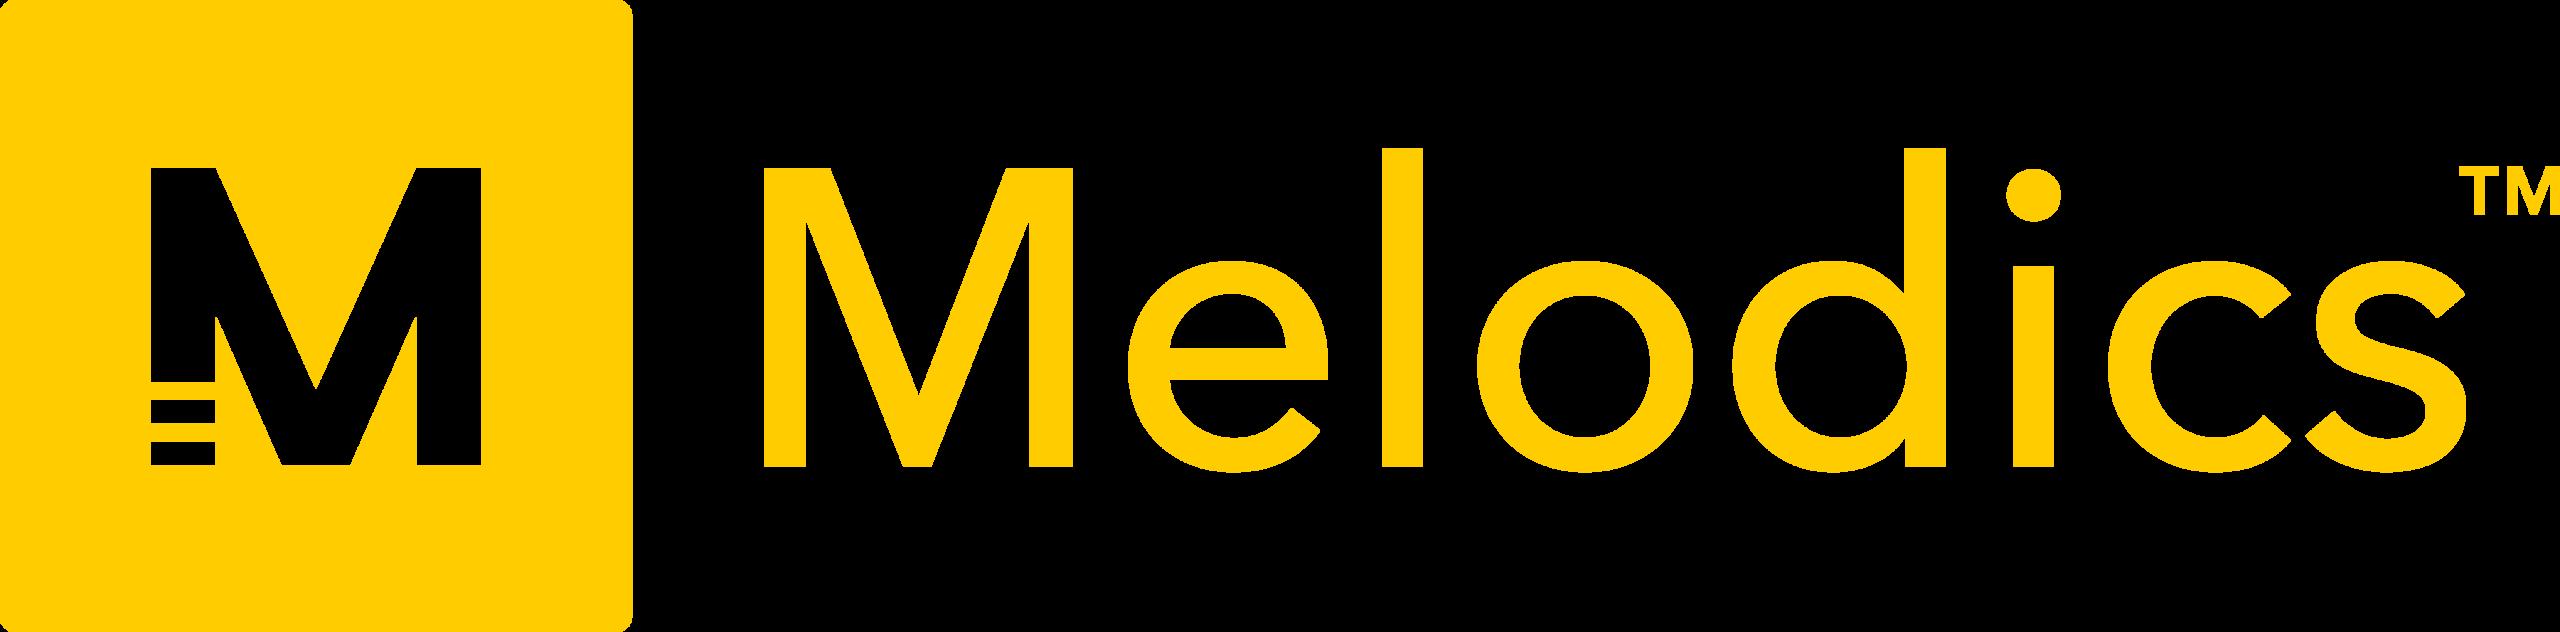 melodics-logo-yellow